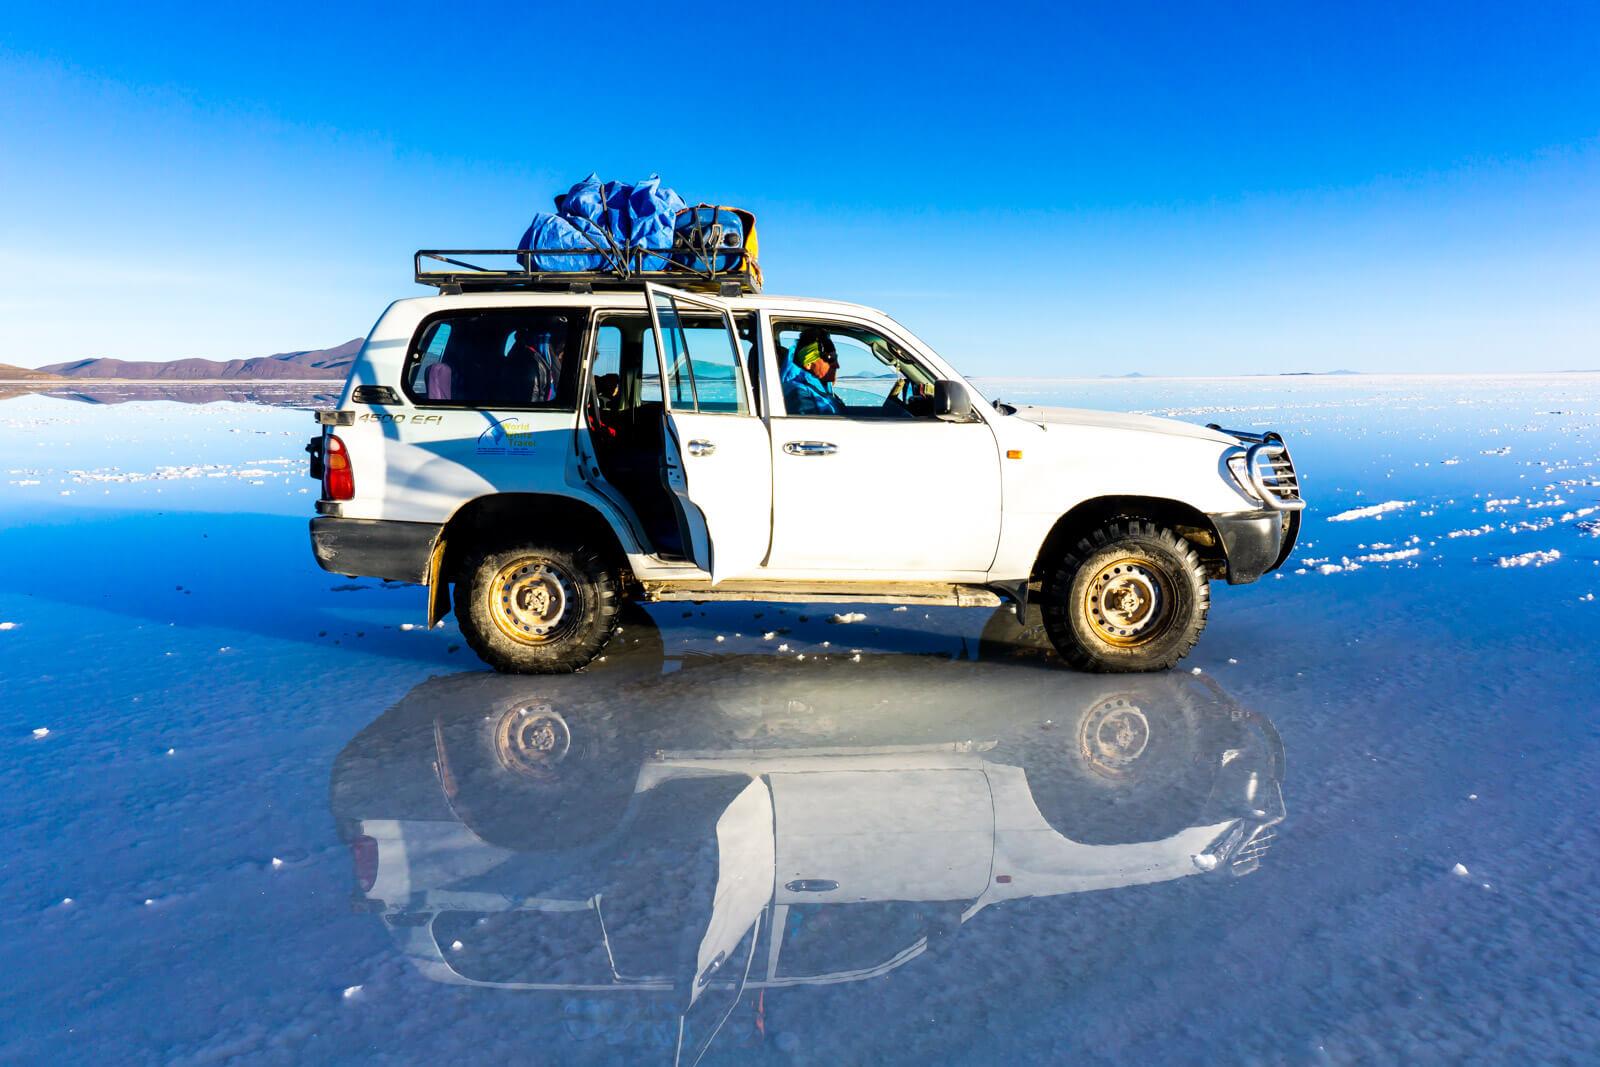 Our Minivan of Wonders at the Salar de Uyuni